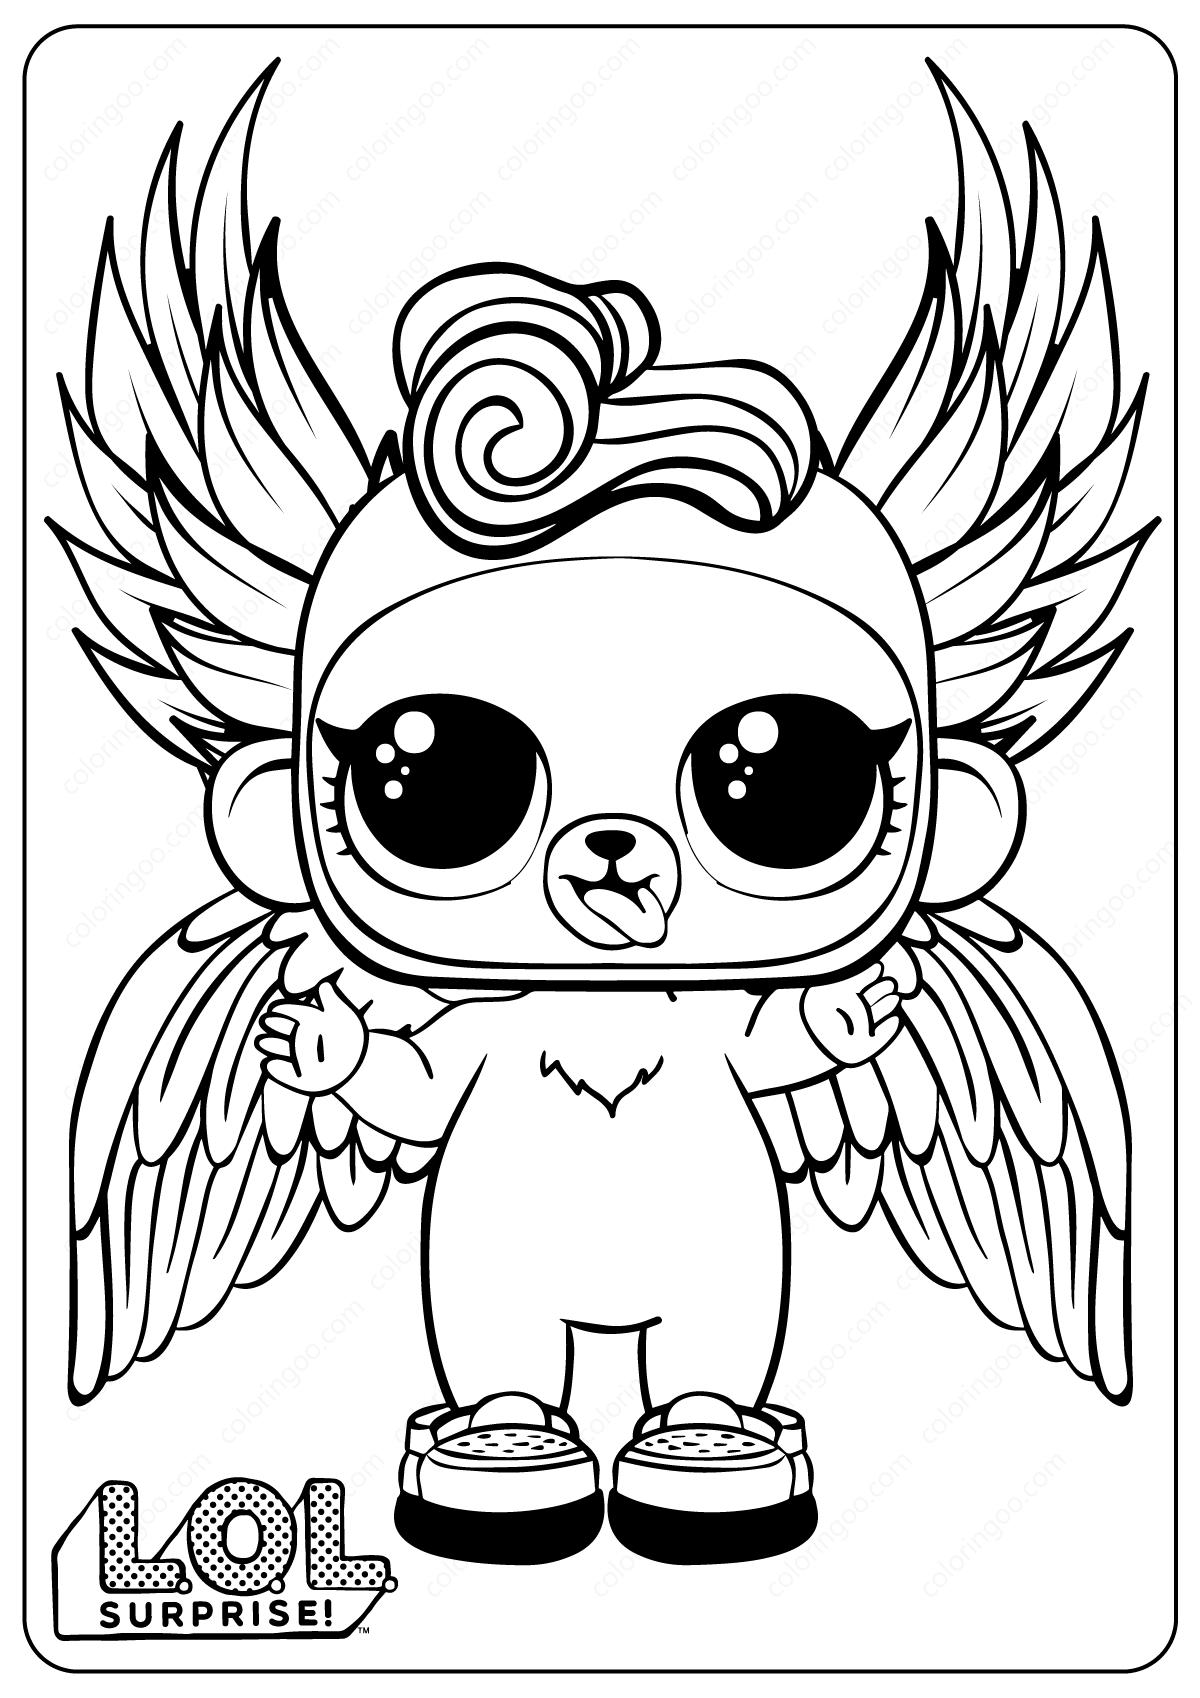 Free Printable Lol Surprise Monkey Coloring Pages Monkey Coloring Pages Coloring Pages Kitty Coloring